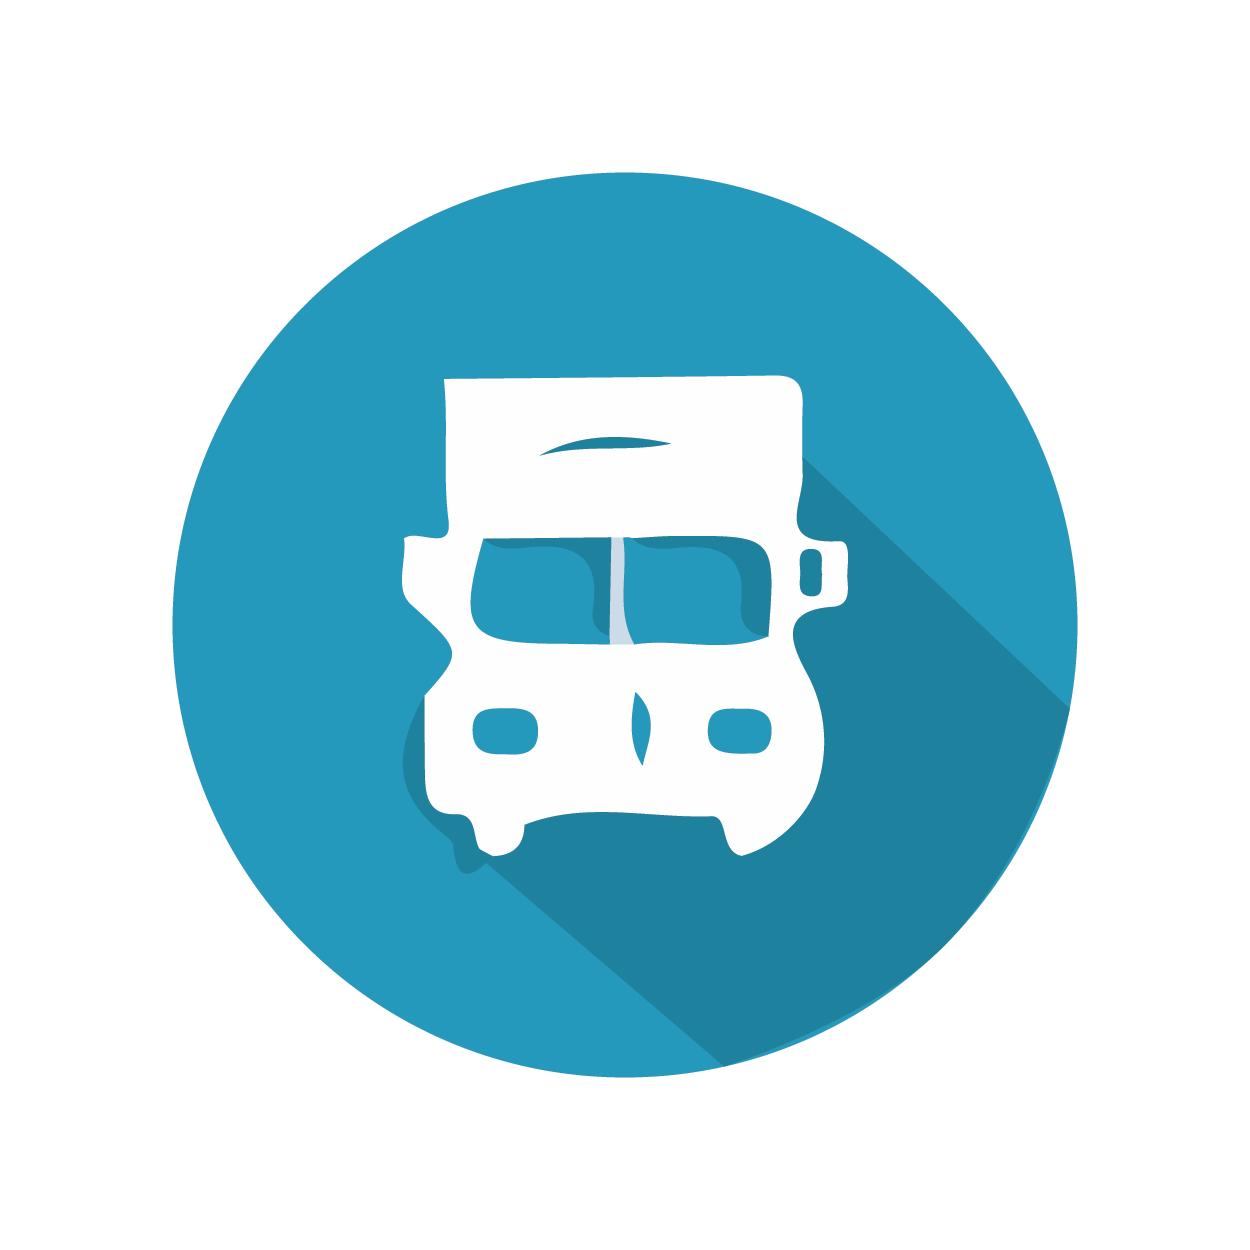 Transportation clipart roadways. Htl group honesty trust